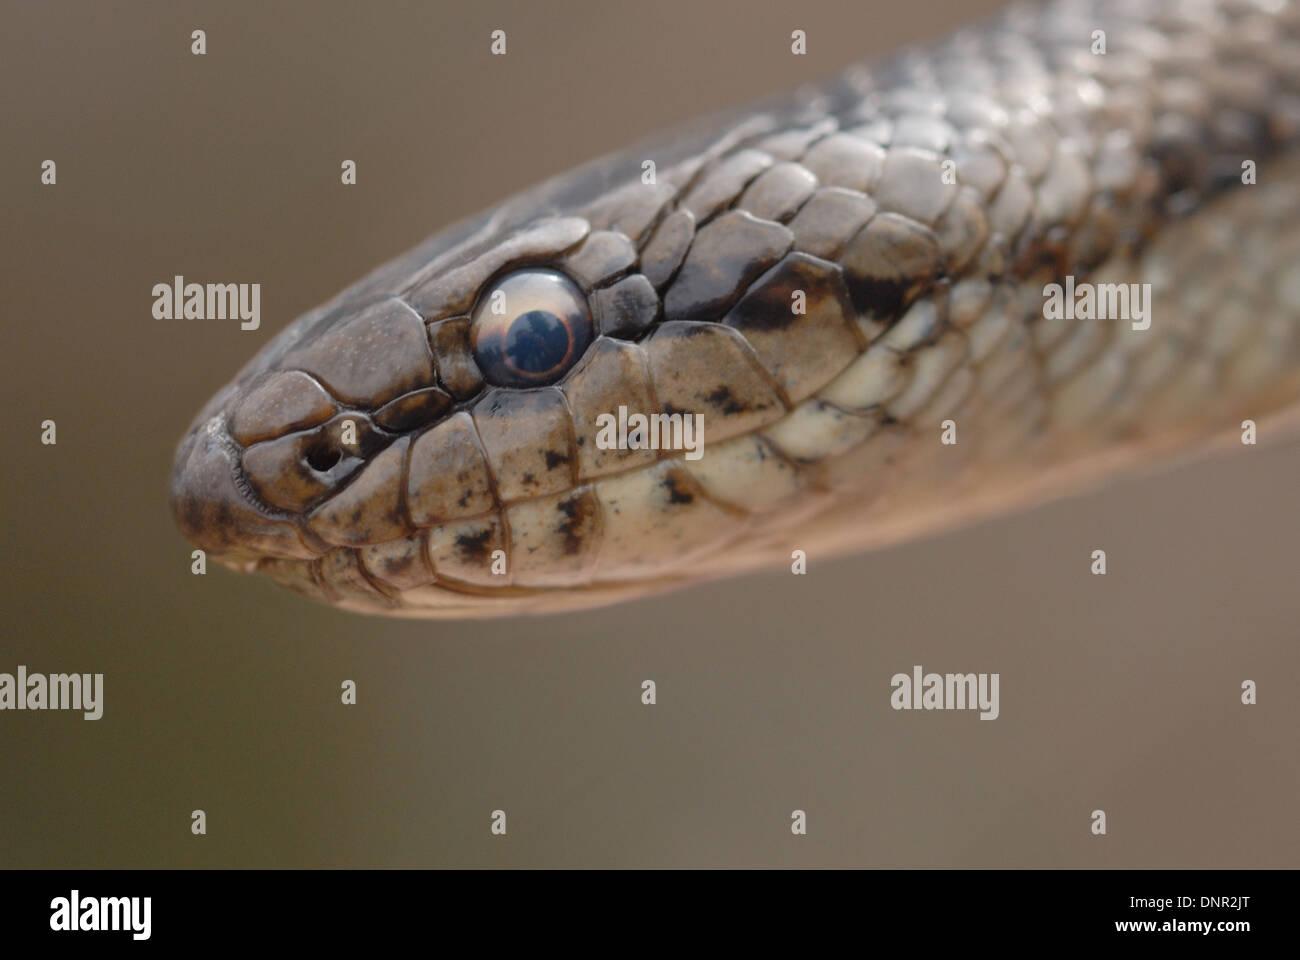 Smooth Snake (Coronella austriaca) on an English heath - Stock Image